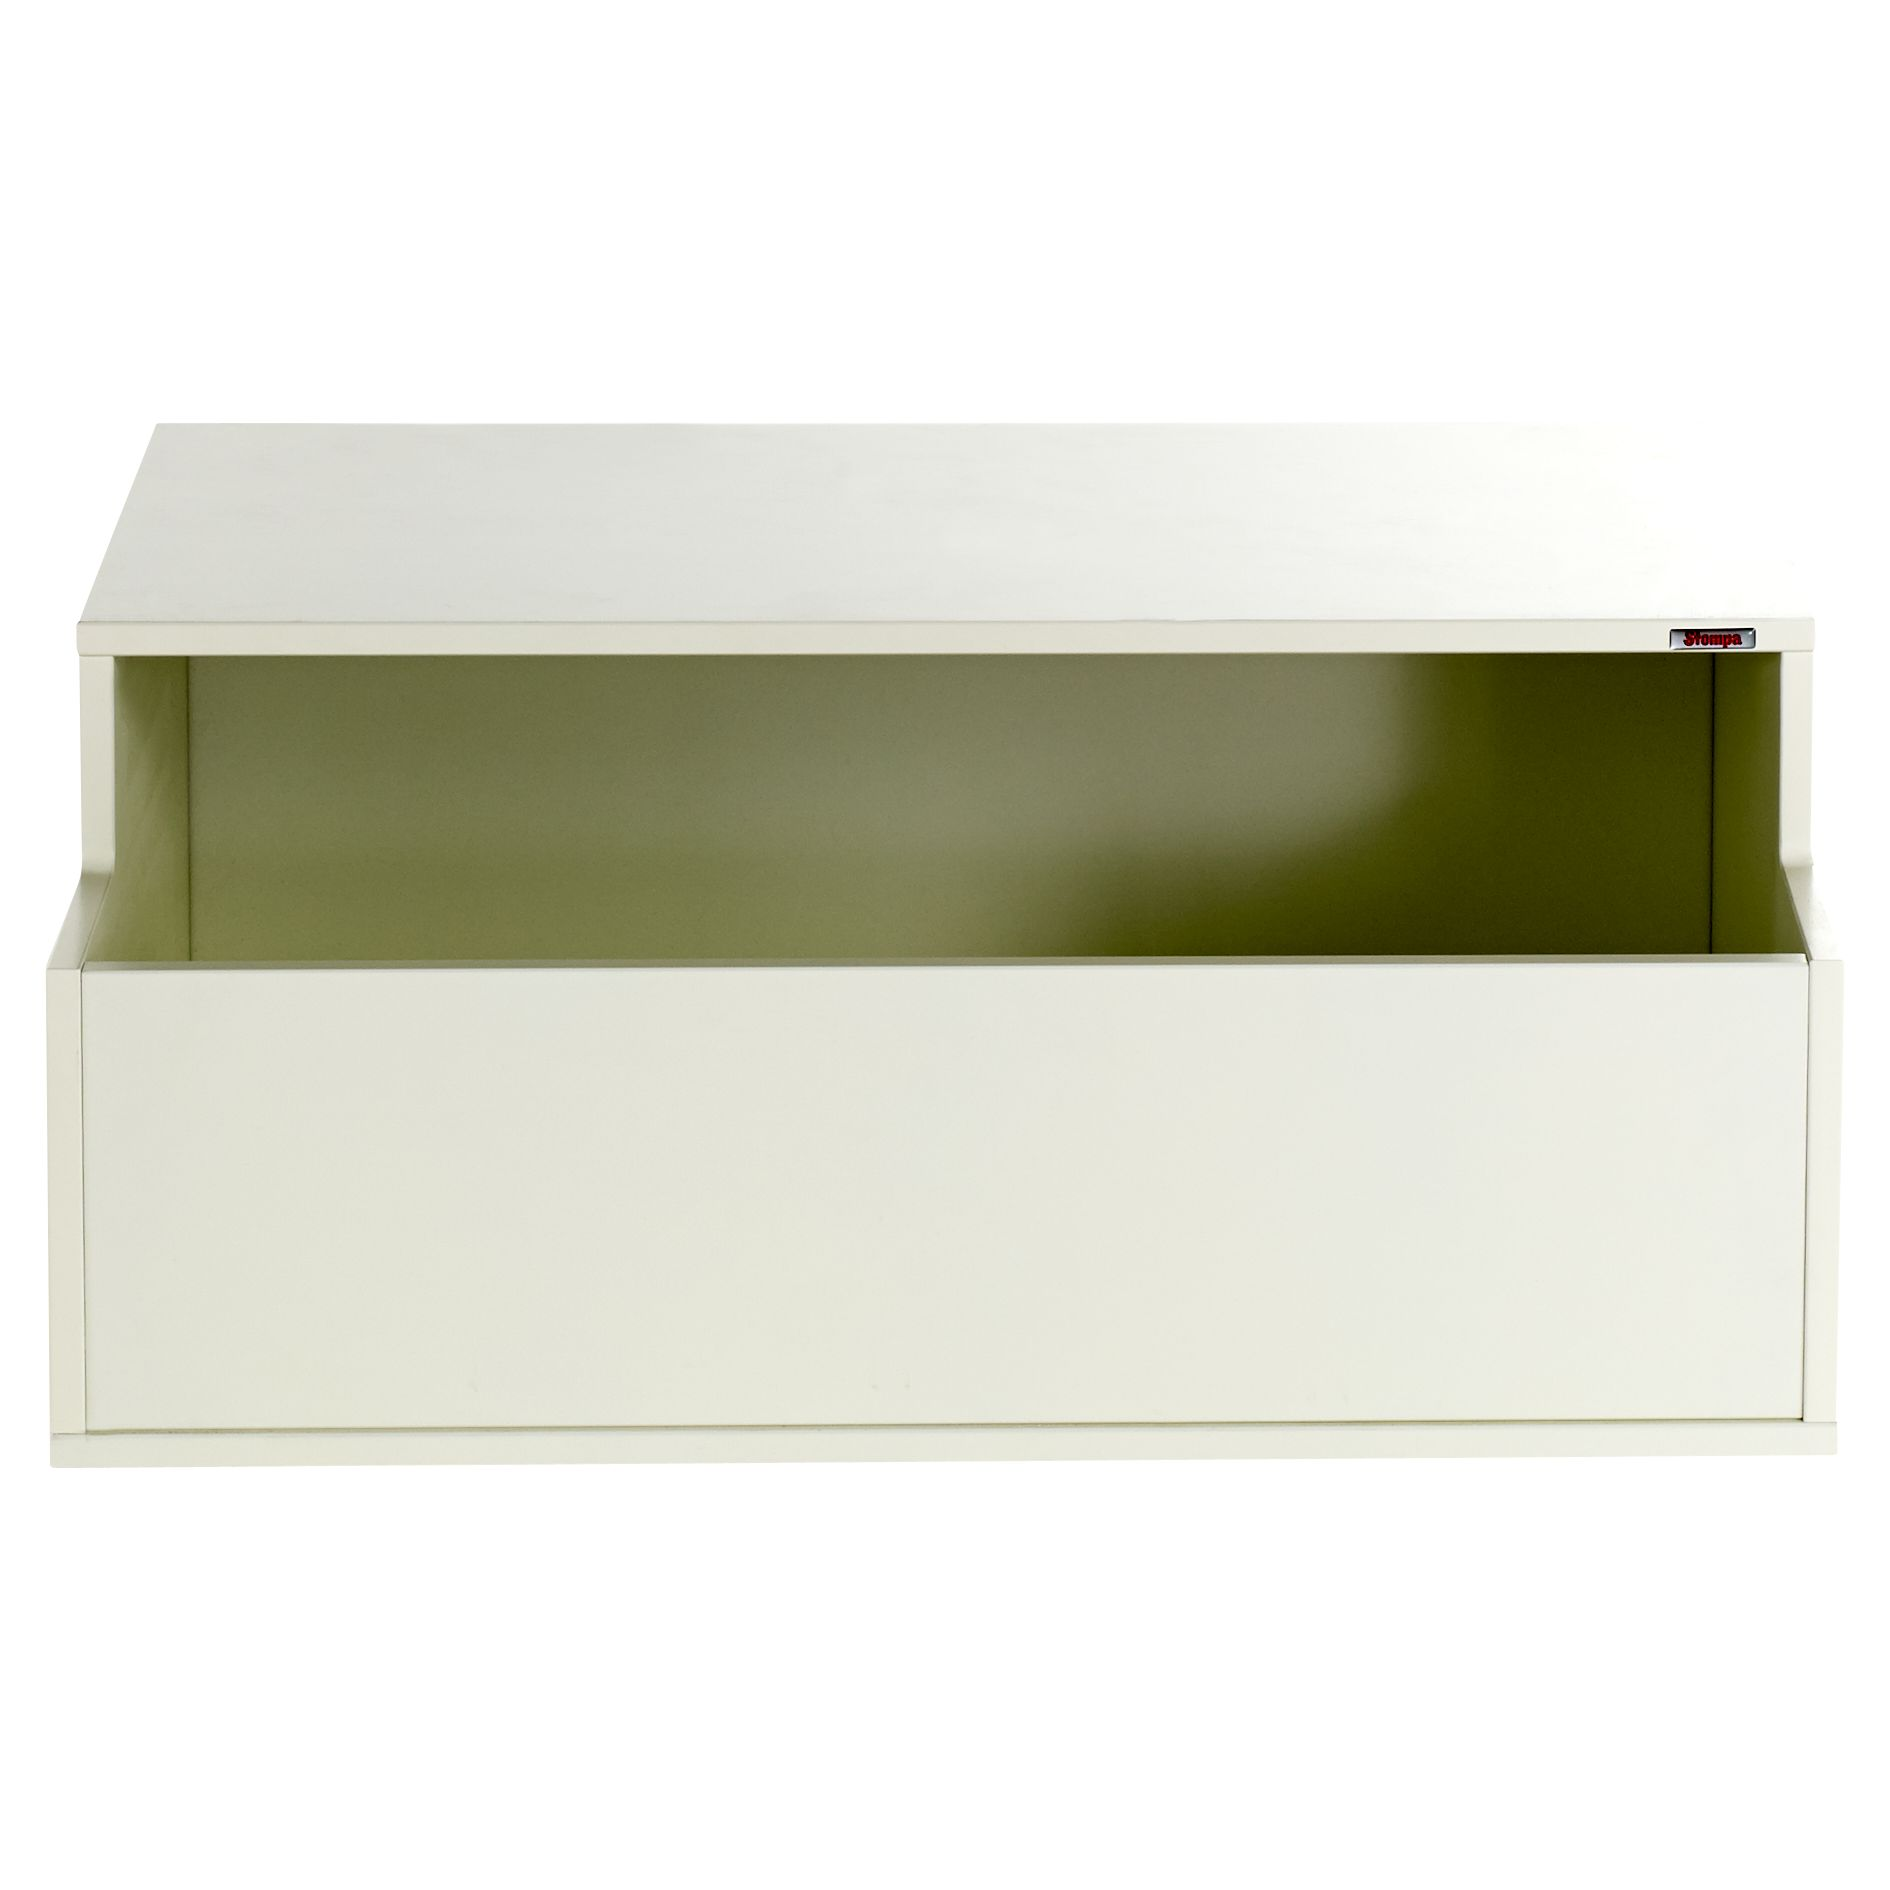 Stompa Stompa Uno S Plus Deep Base Toy Box, White